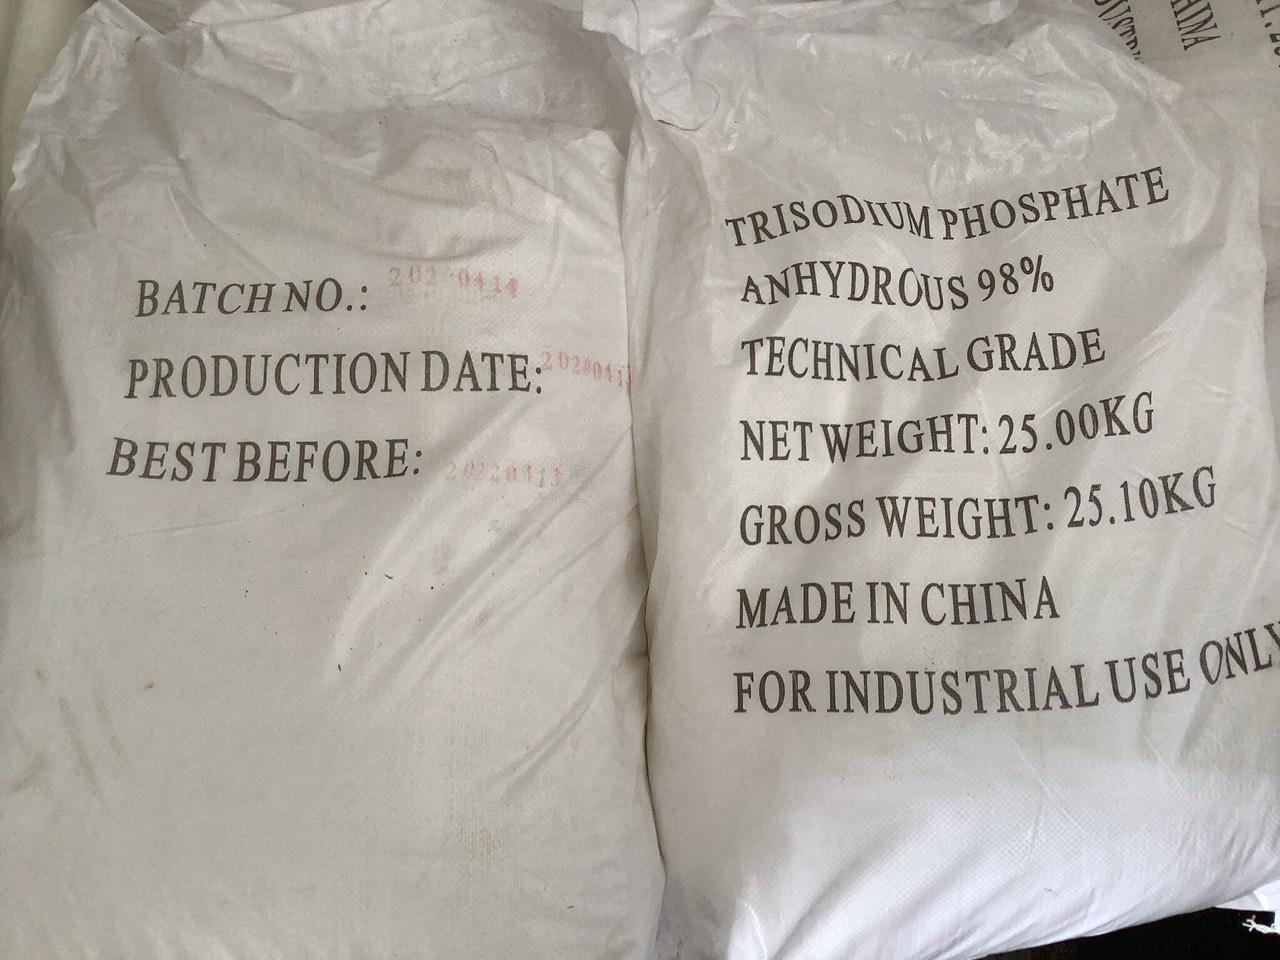 Trisodium Phosphate Anhydrous 98% - Na3PO4